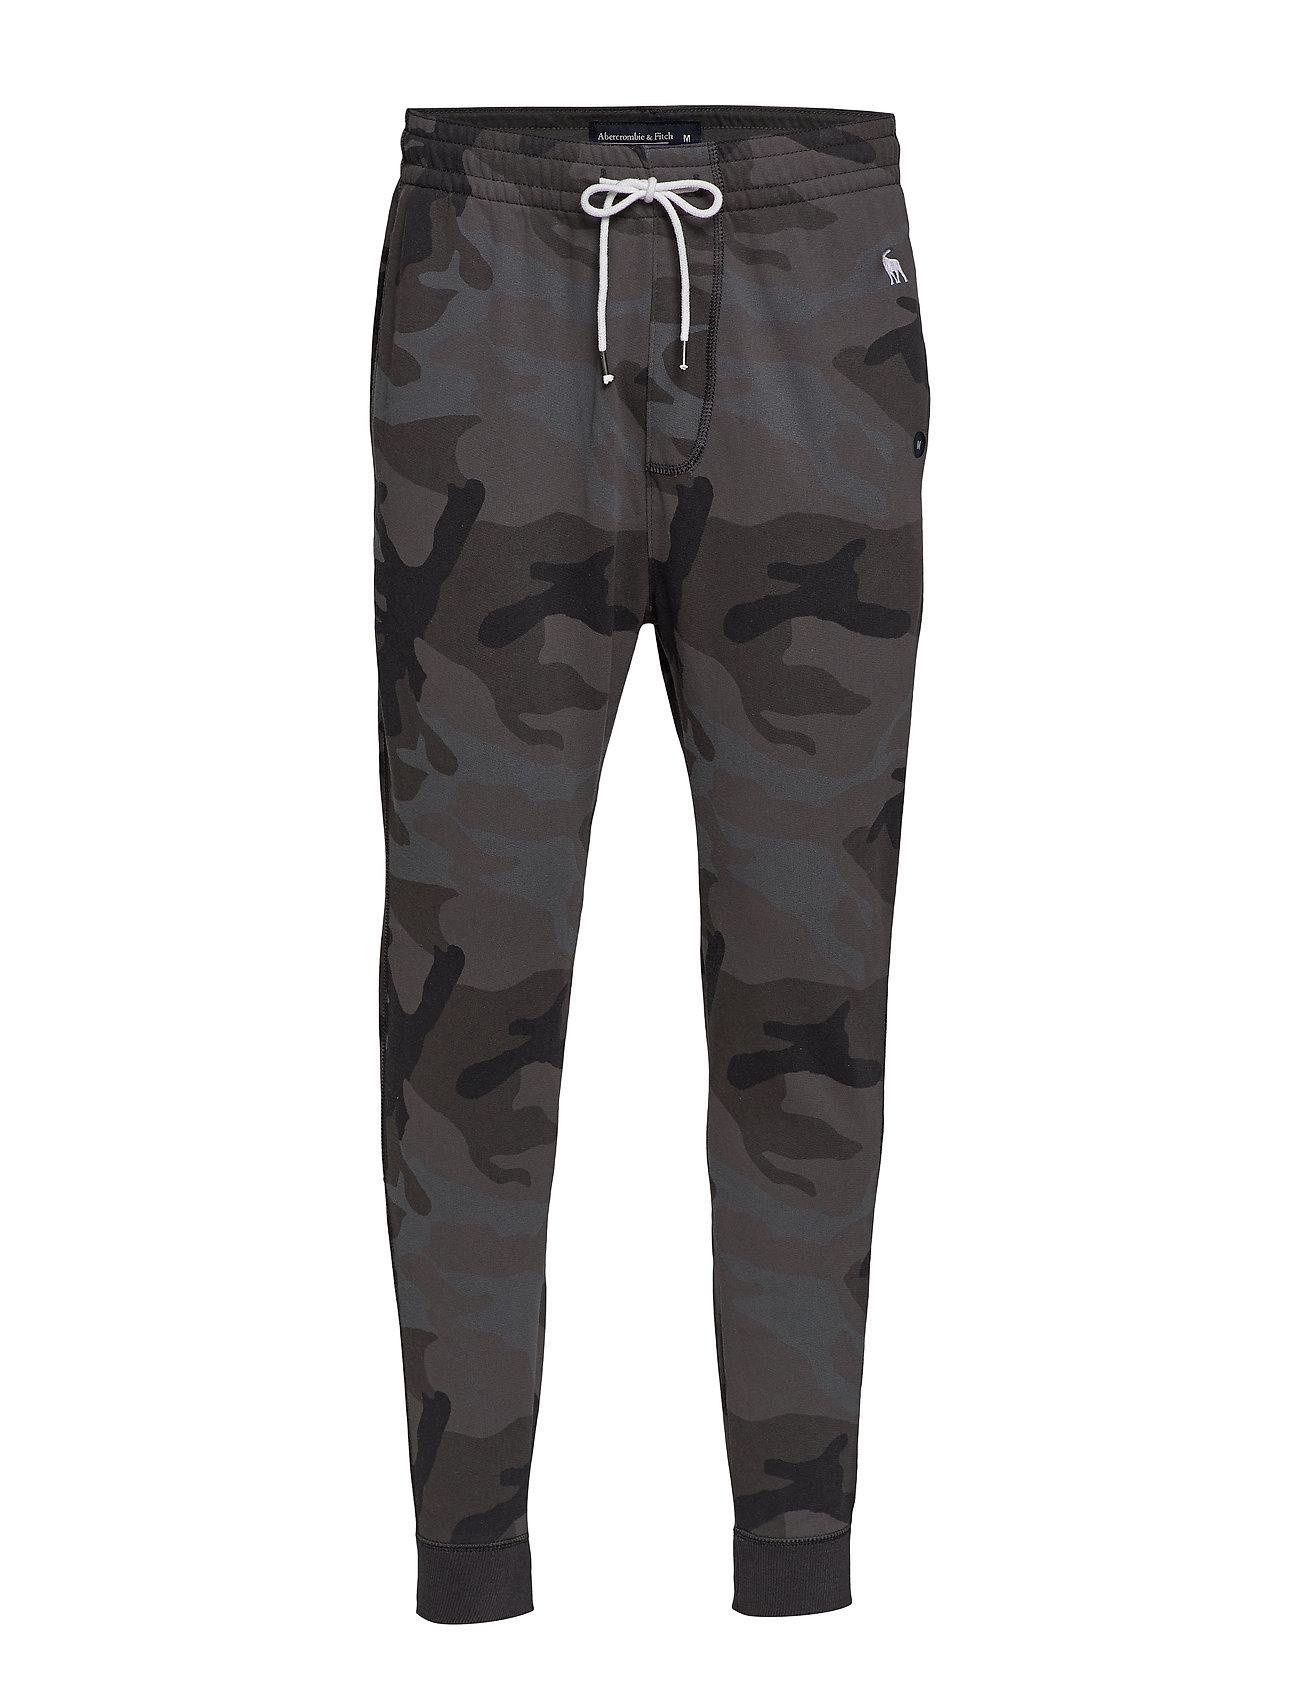 Abercrombie & Fitch Jogger - BLACK PRINT